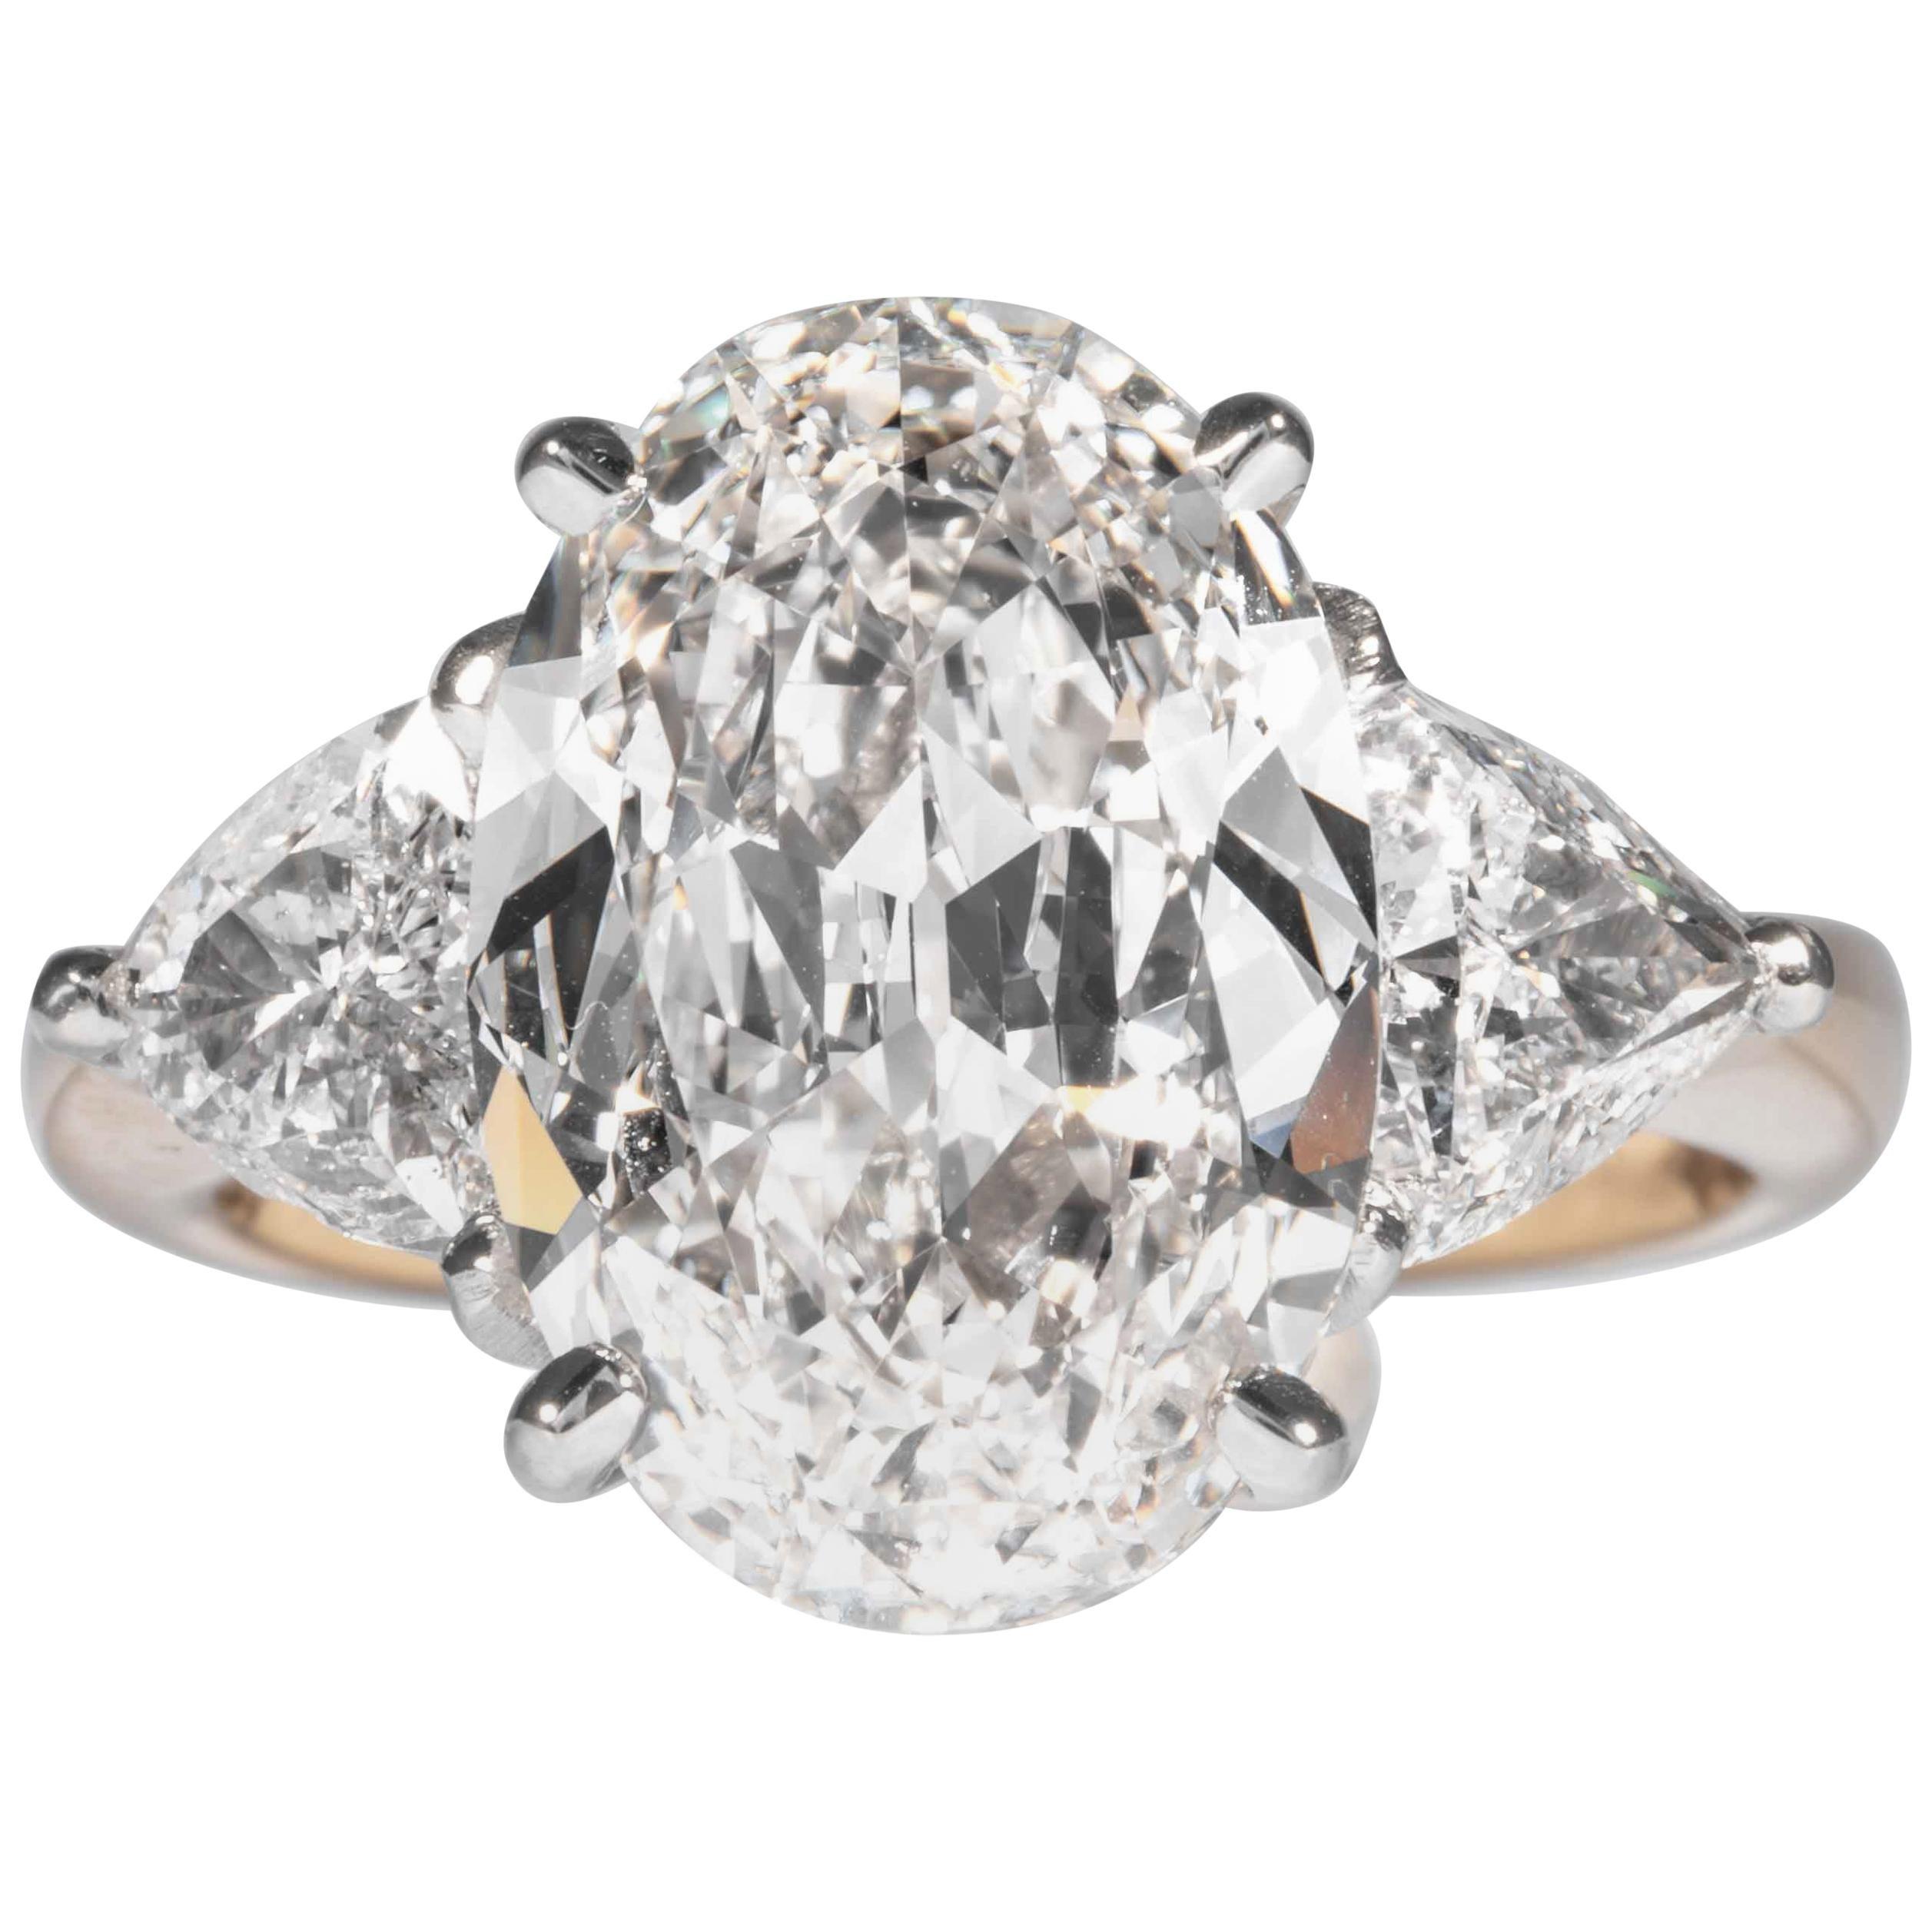 Shreve, Crump & Low GIA Certified 5.03 Carat H VS1 Oval Cut Diamond 3-Stone Ring